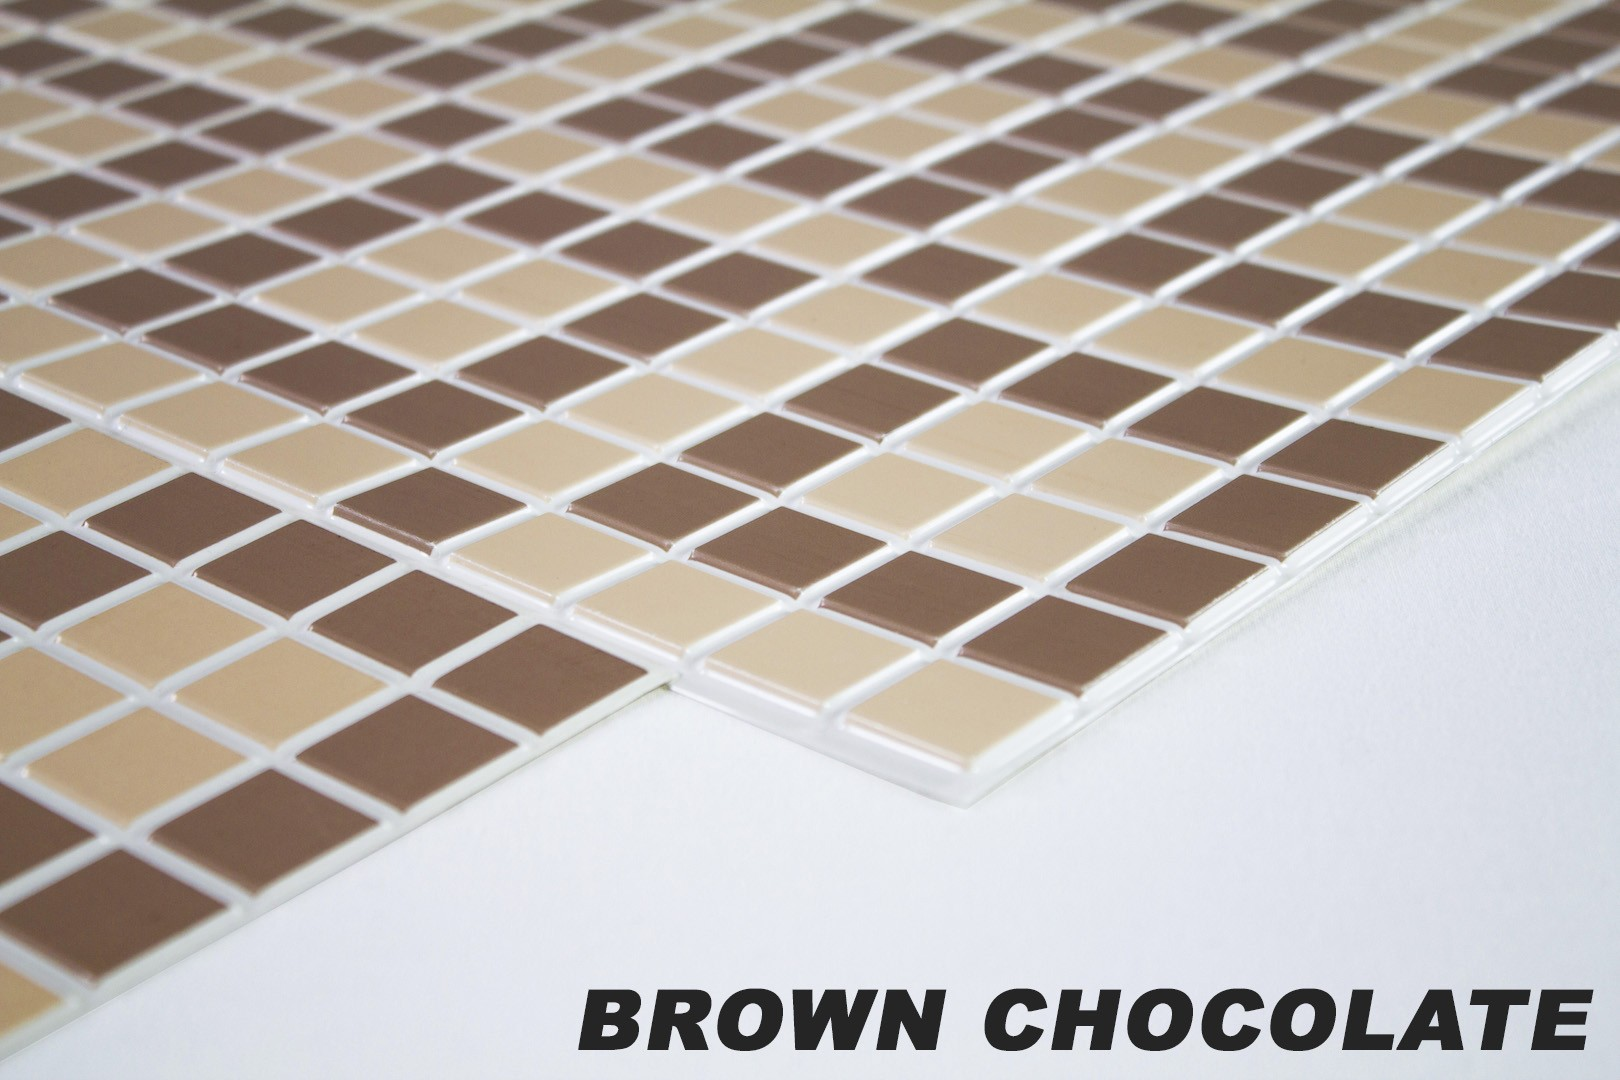 Brown chocolate originalbild 1